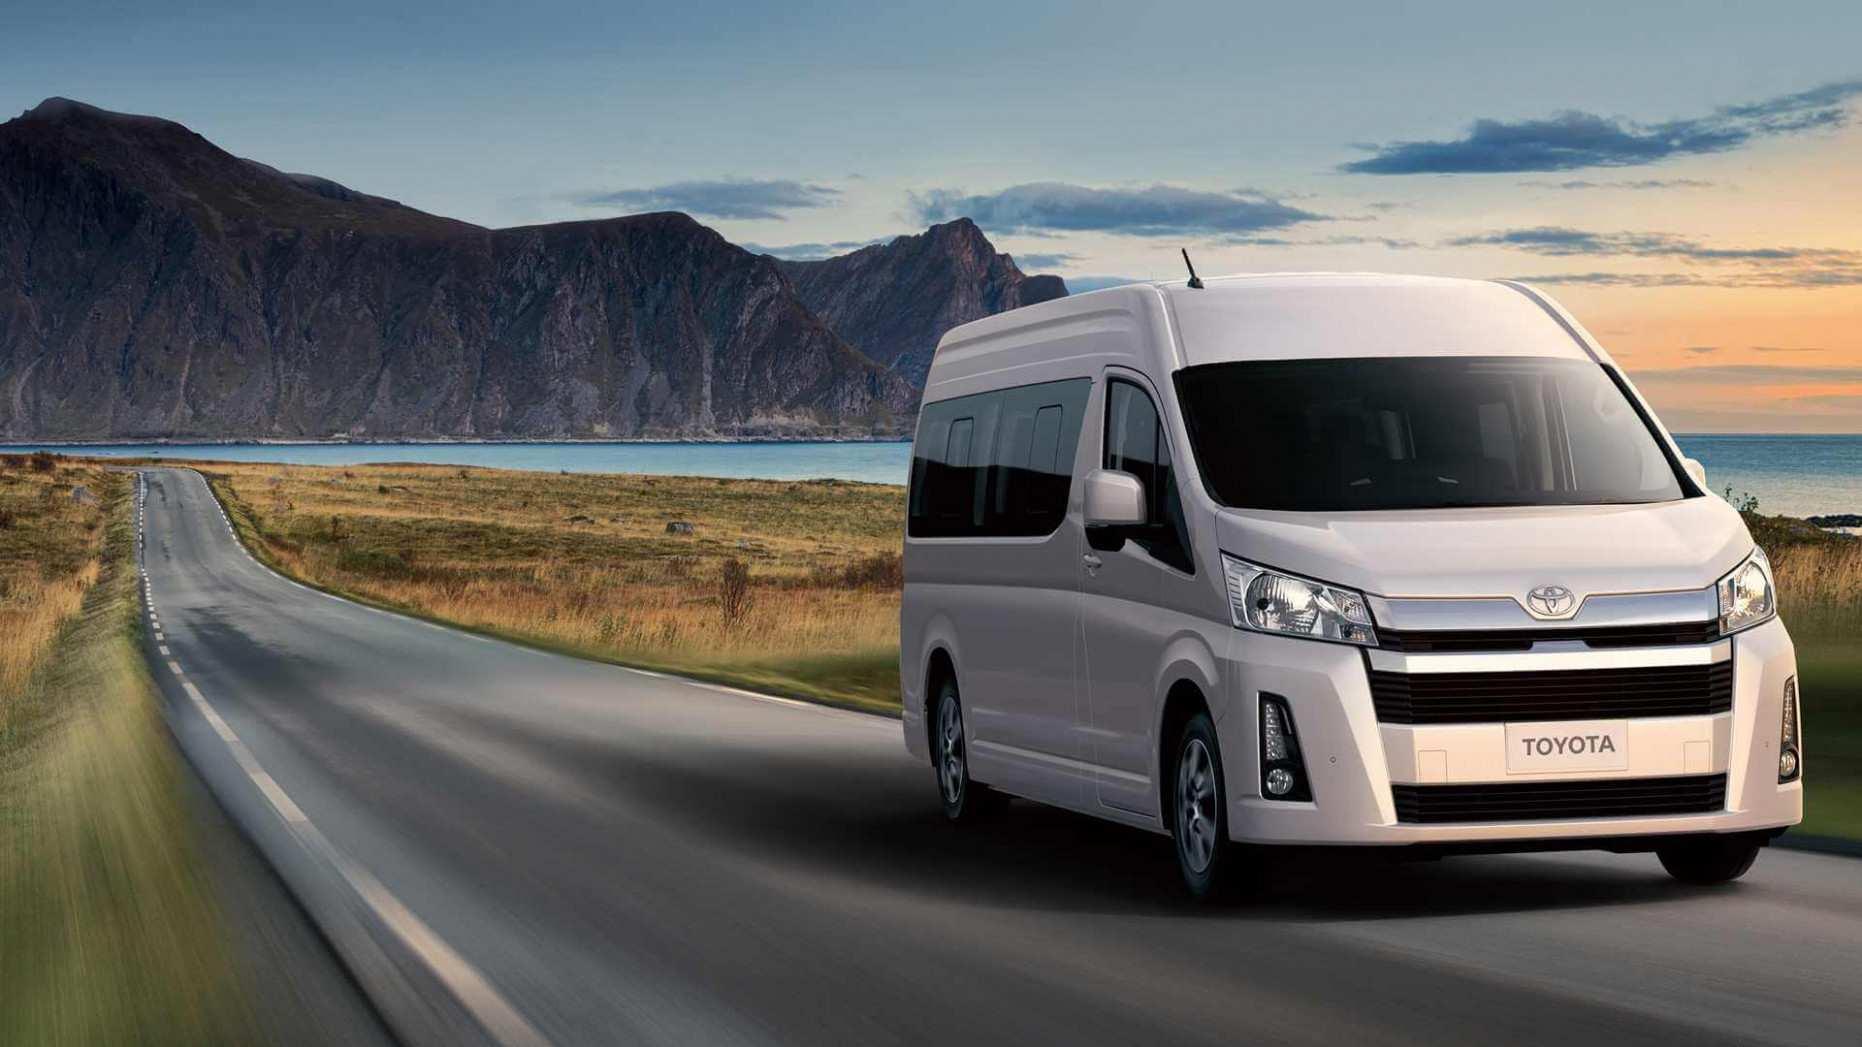 28 Best Review 2020 Toyota Quantum Interior Price and Review for 2020 Toyota Quantum Interior